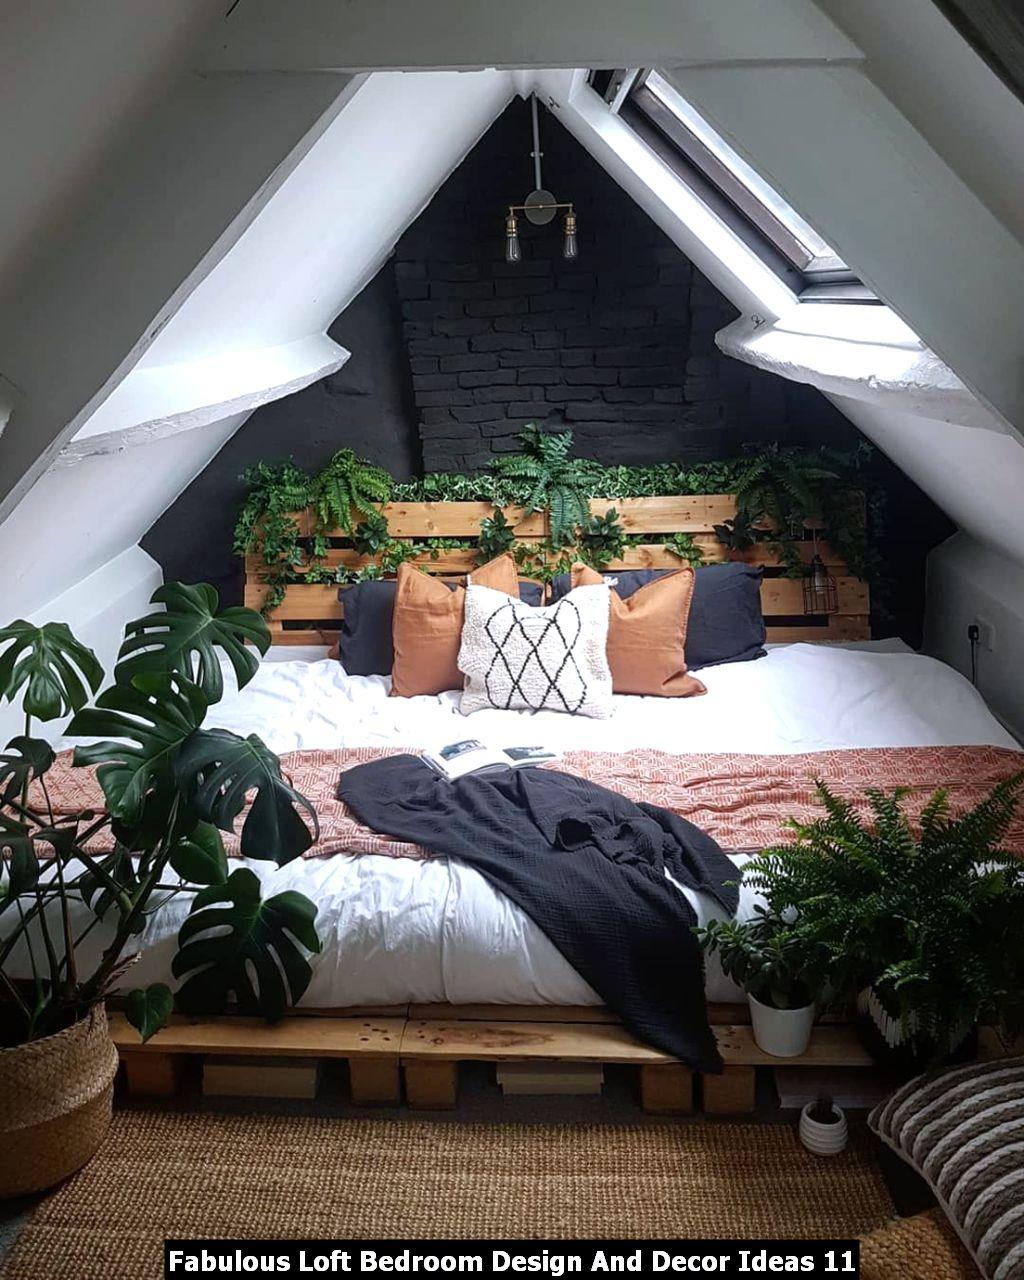 Fabulous Loft Bedroom Design And Decor Ideas 11